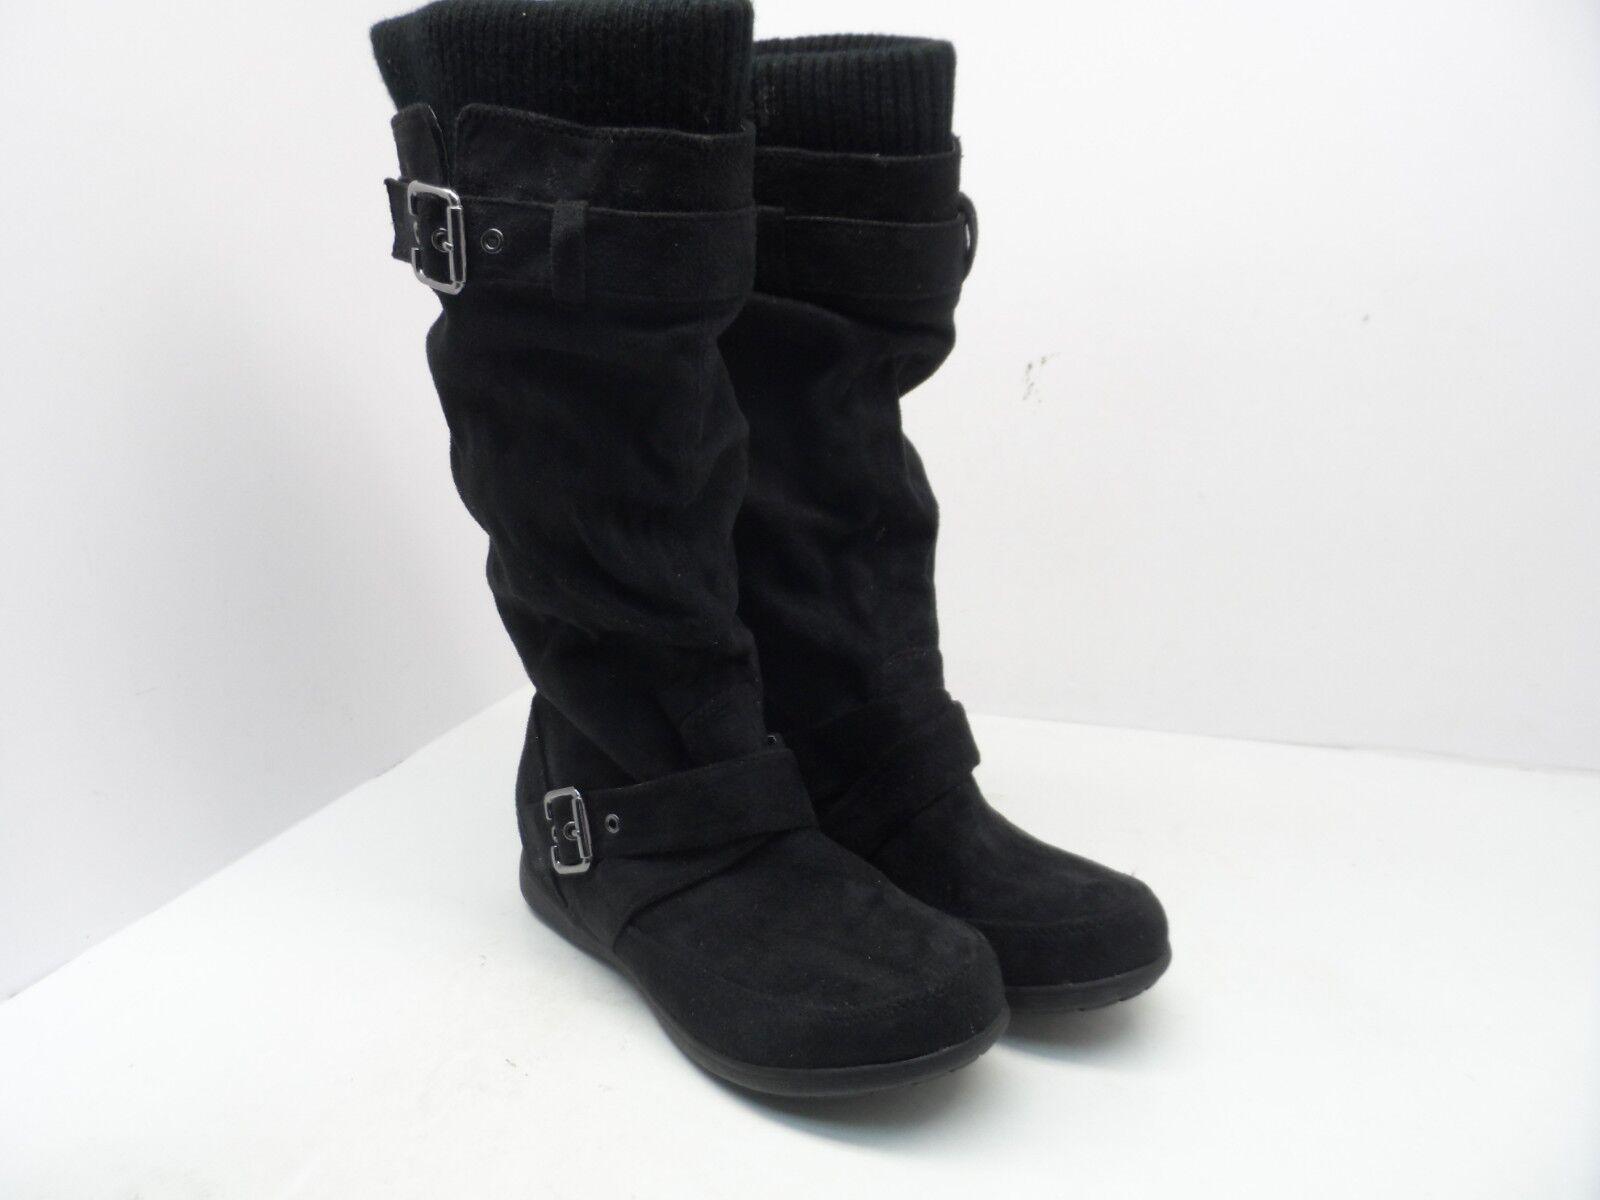 Zigi Women's Marilyn Knee High Fabric Black Faux Fur Lined Boot Black Fabric Size 7.5M 5f8453